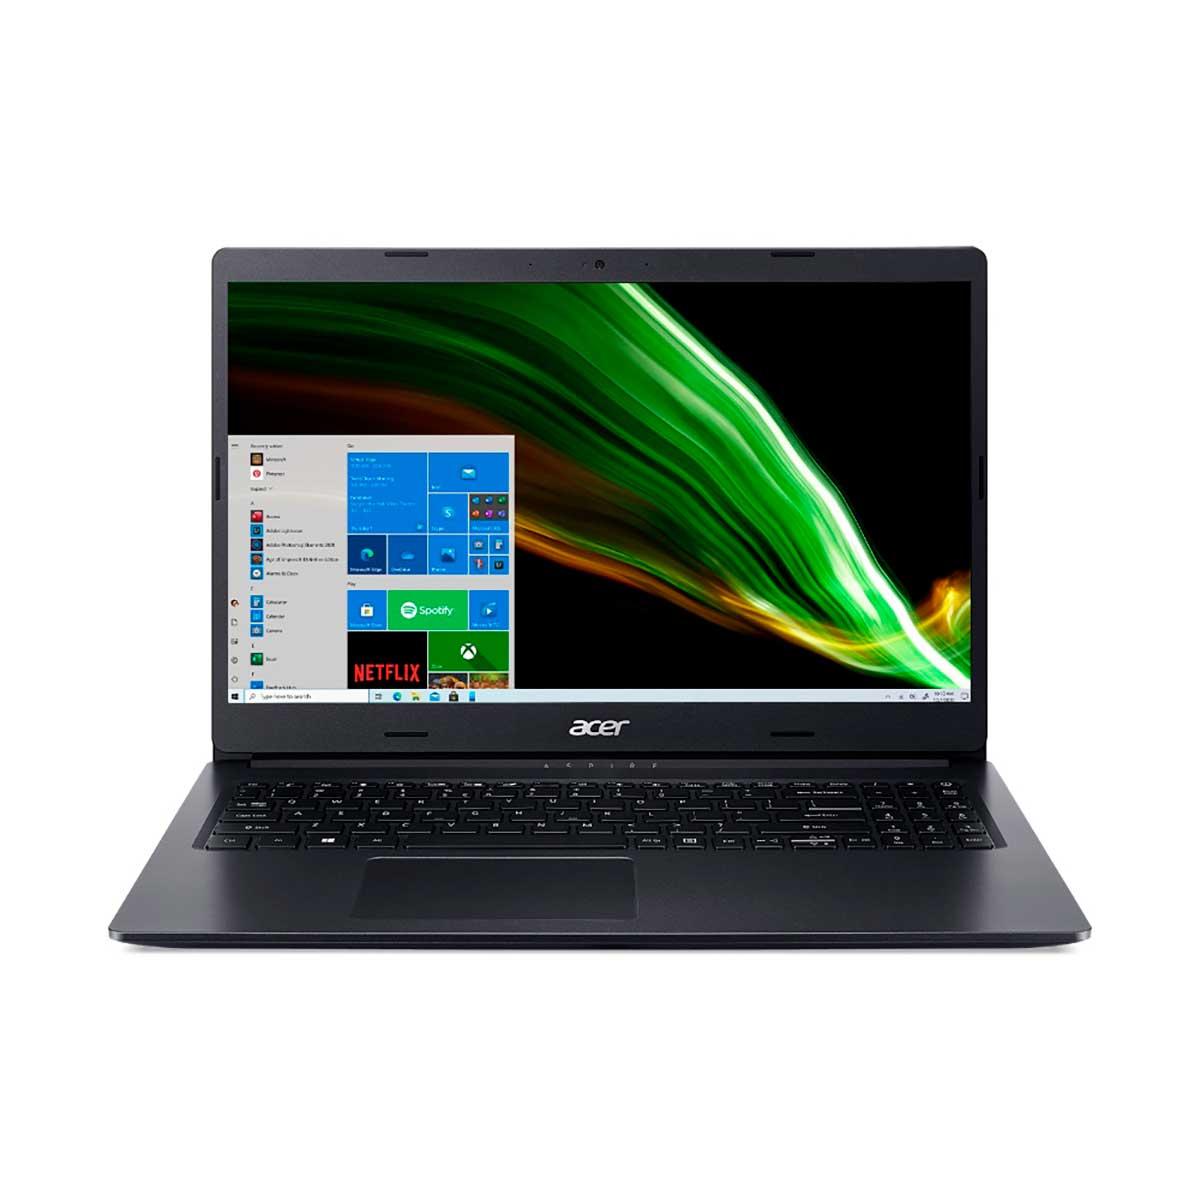 Imagem de Notebook Acer Aspire 3 Amd Ryzen 7-3700u 8gb 256gb Ssd 15.6